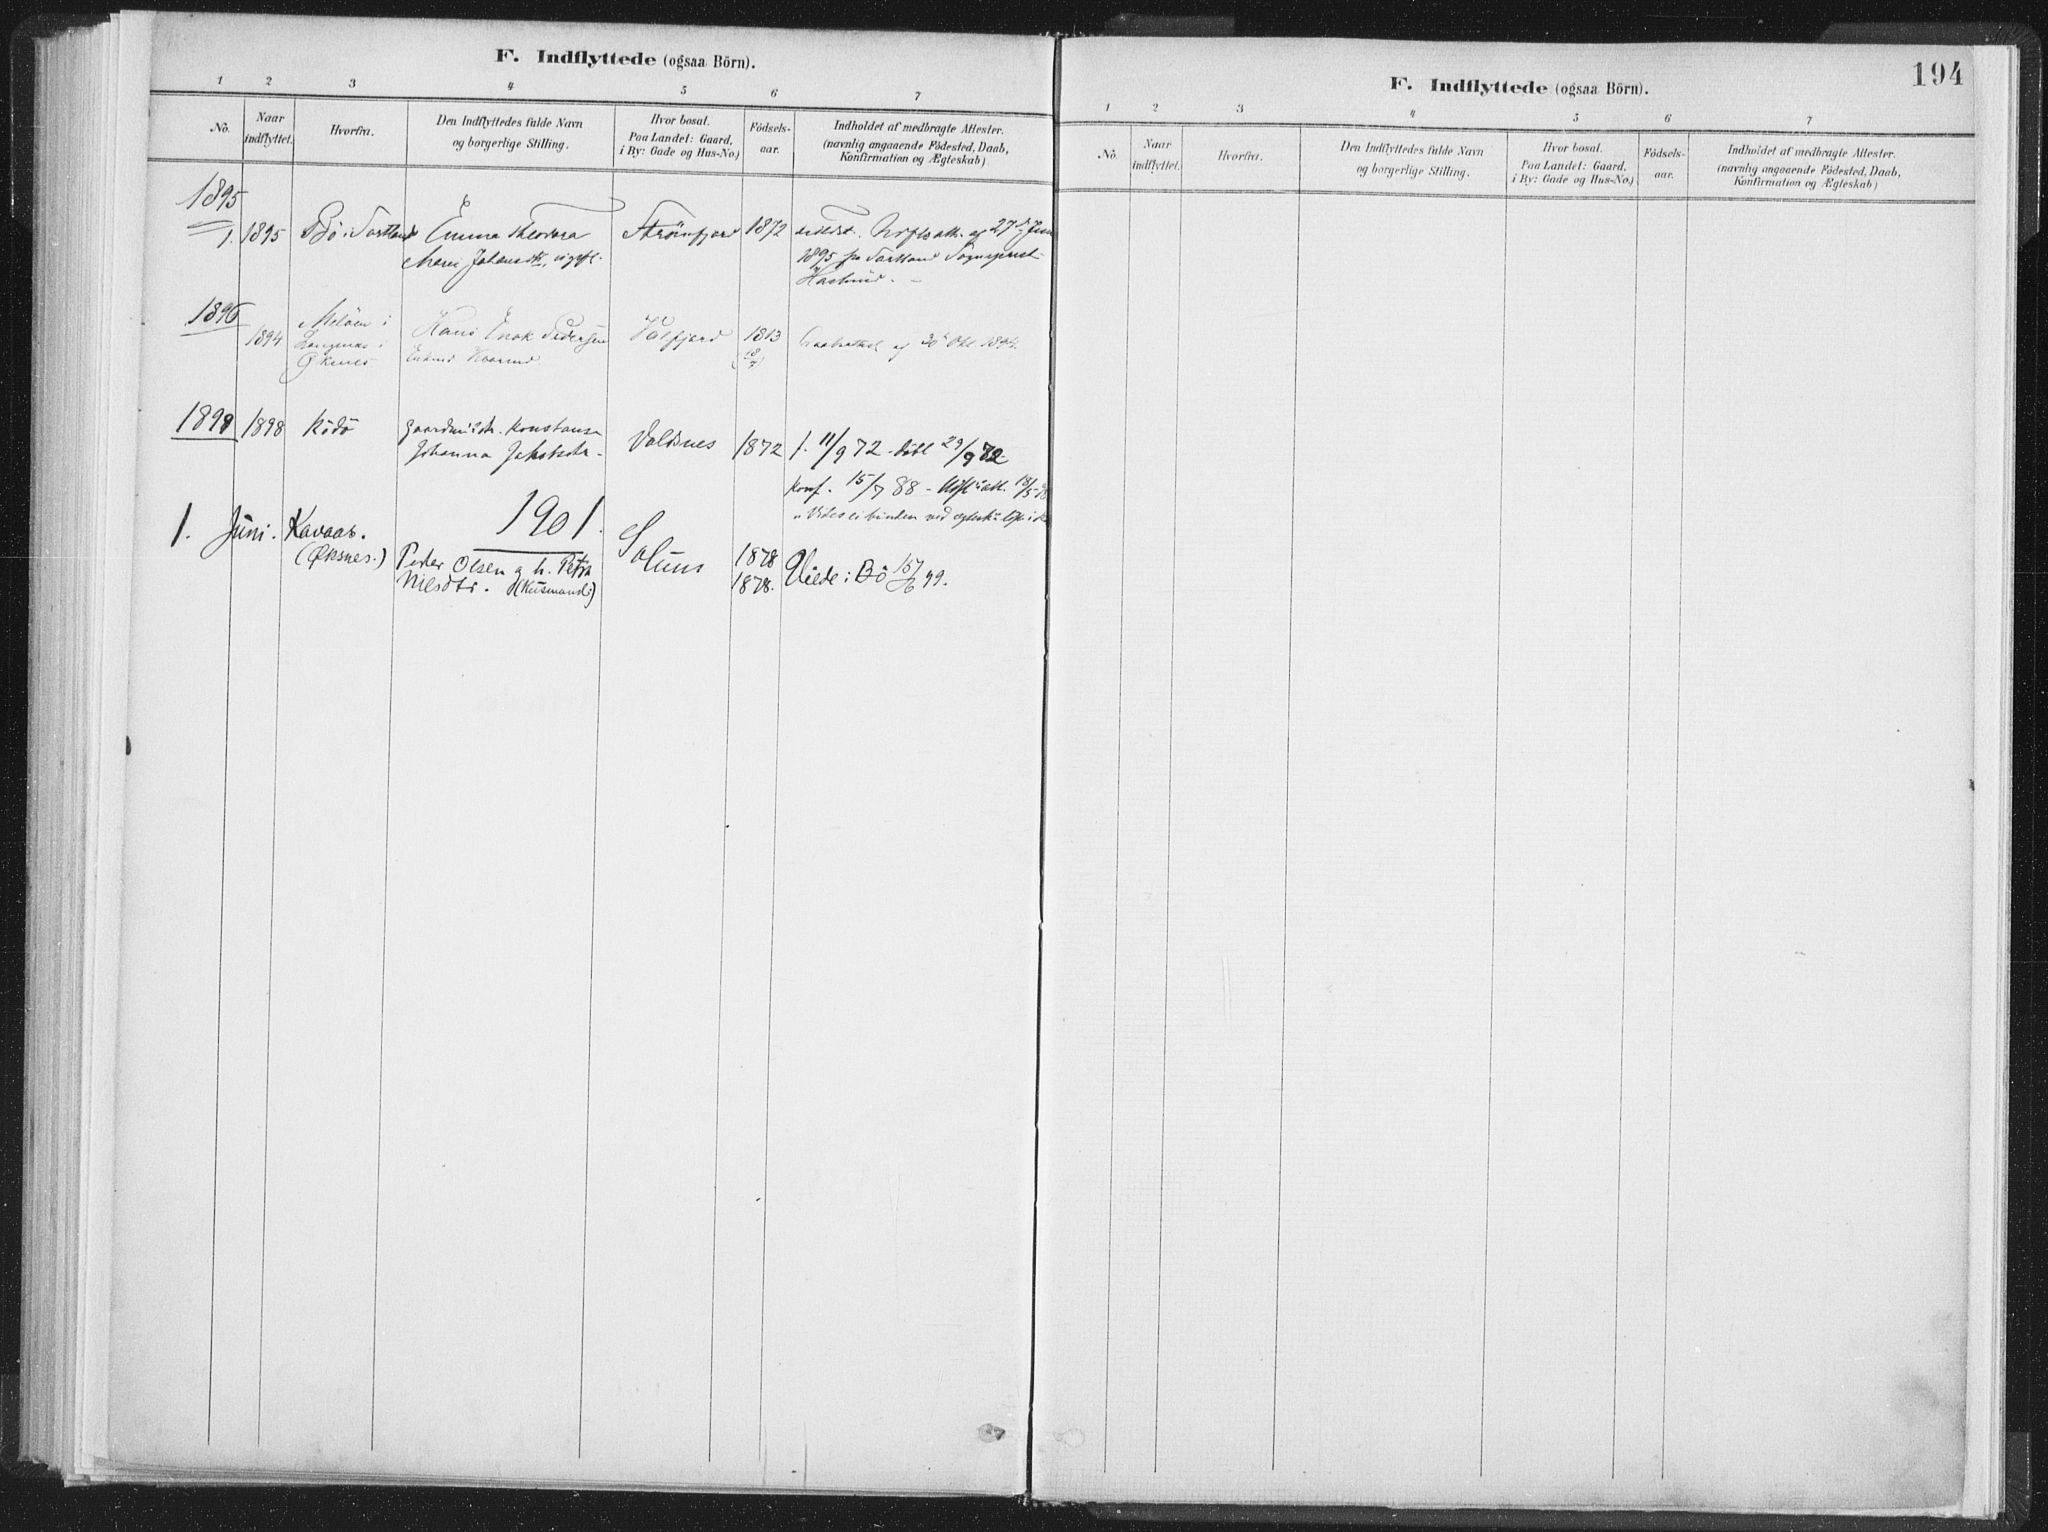 SAT, Ministerialprotokoller, klokkerbøker og fødselsregistre - Nordland, 890/L1286: Ministerialbok nr. 890A01, 1882-1902, s. 194